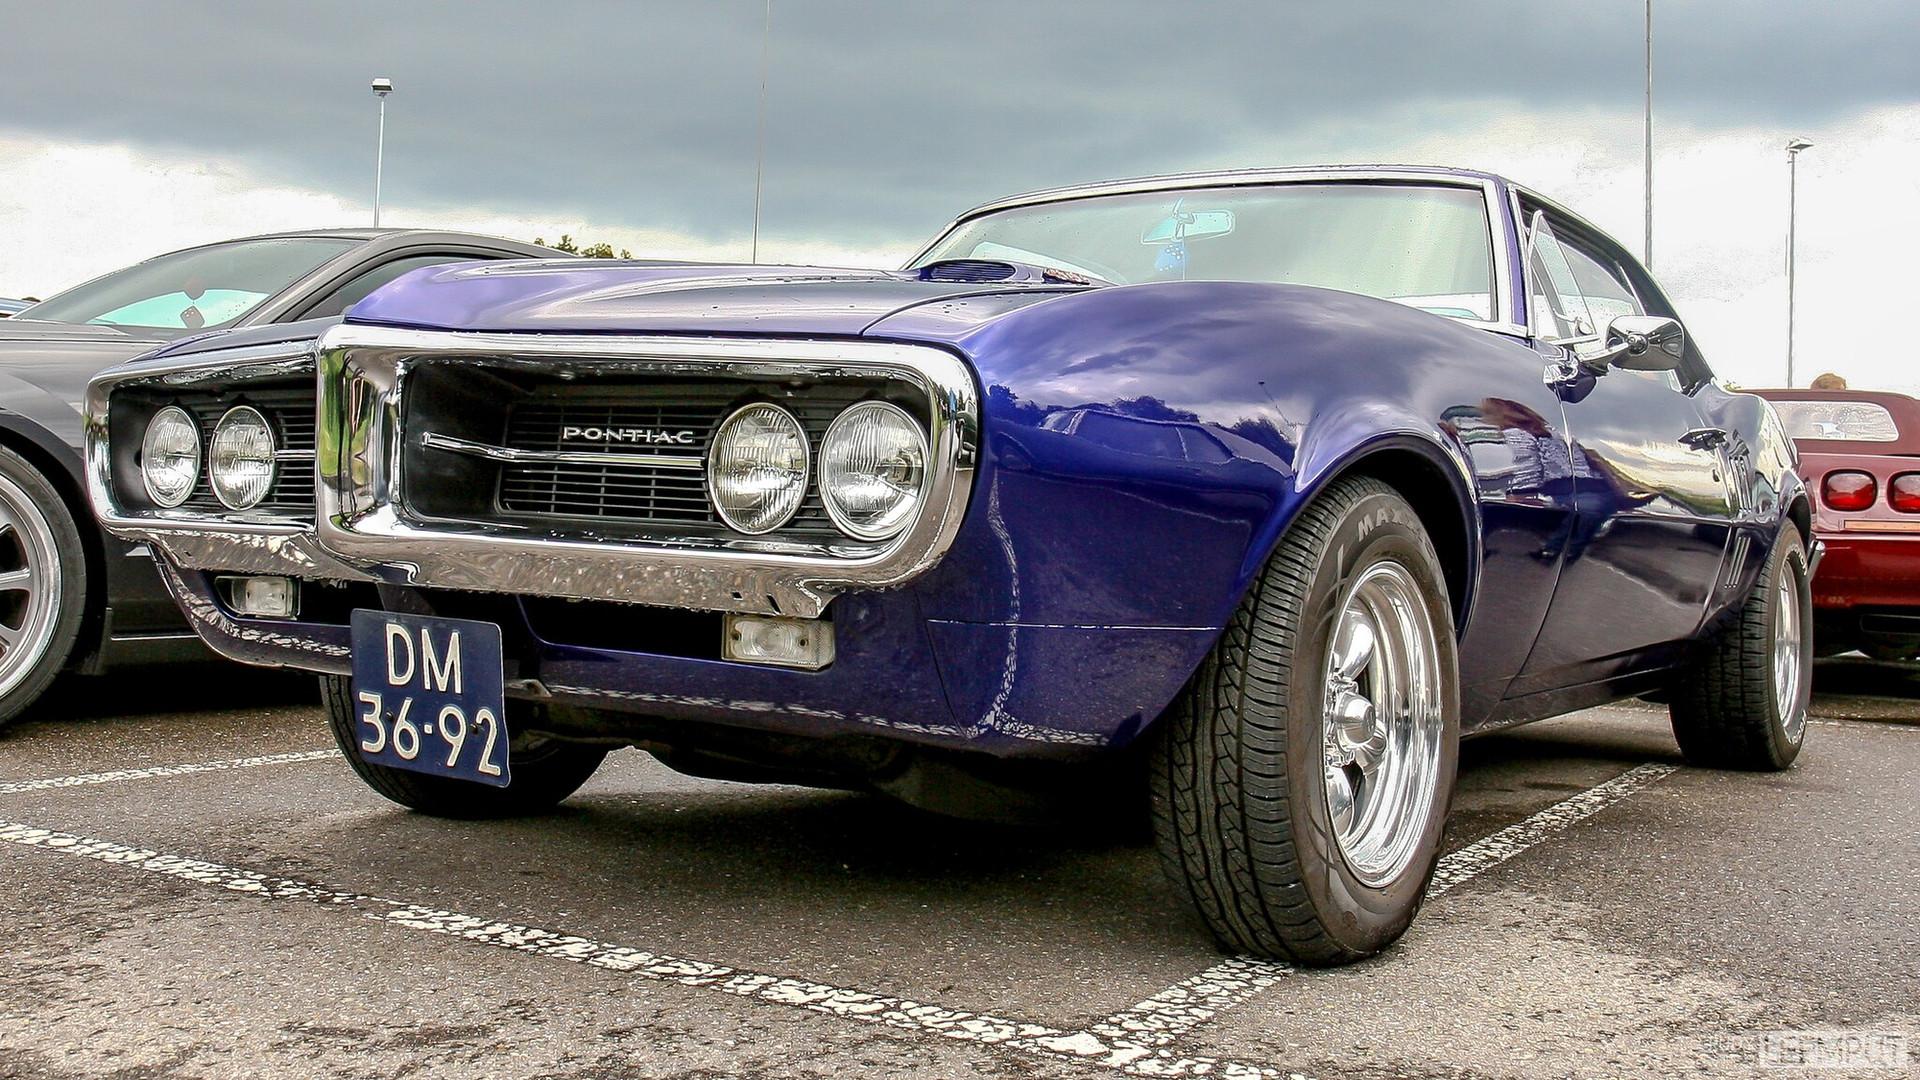 1967 | DM-36-92 | Pontiac Firebird